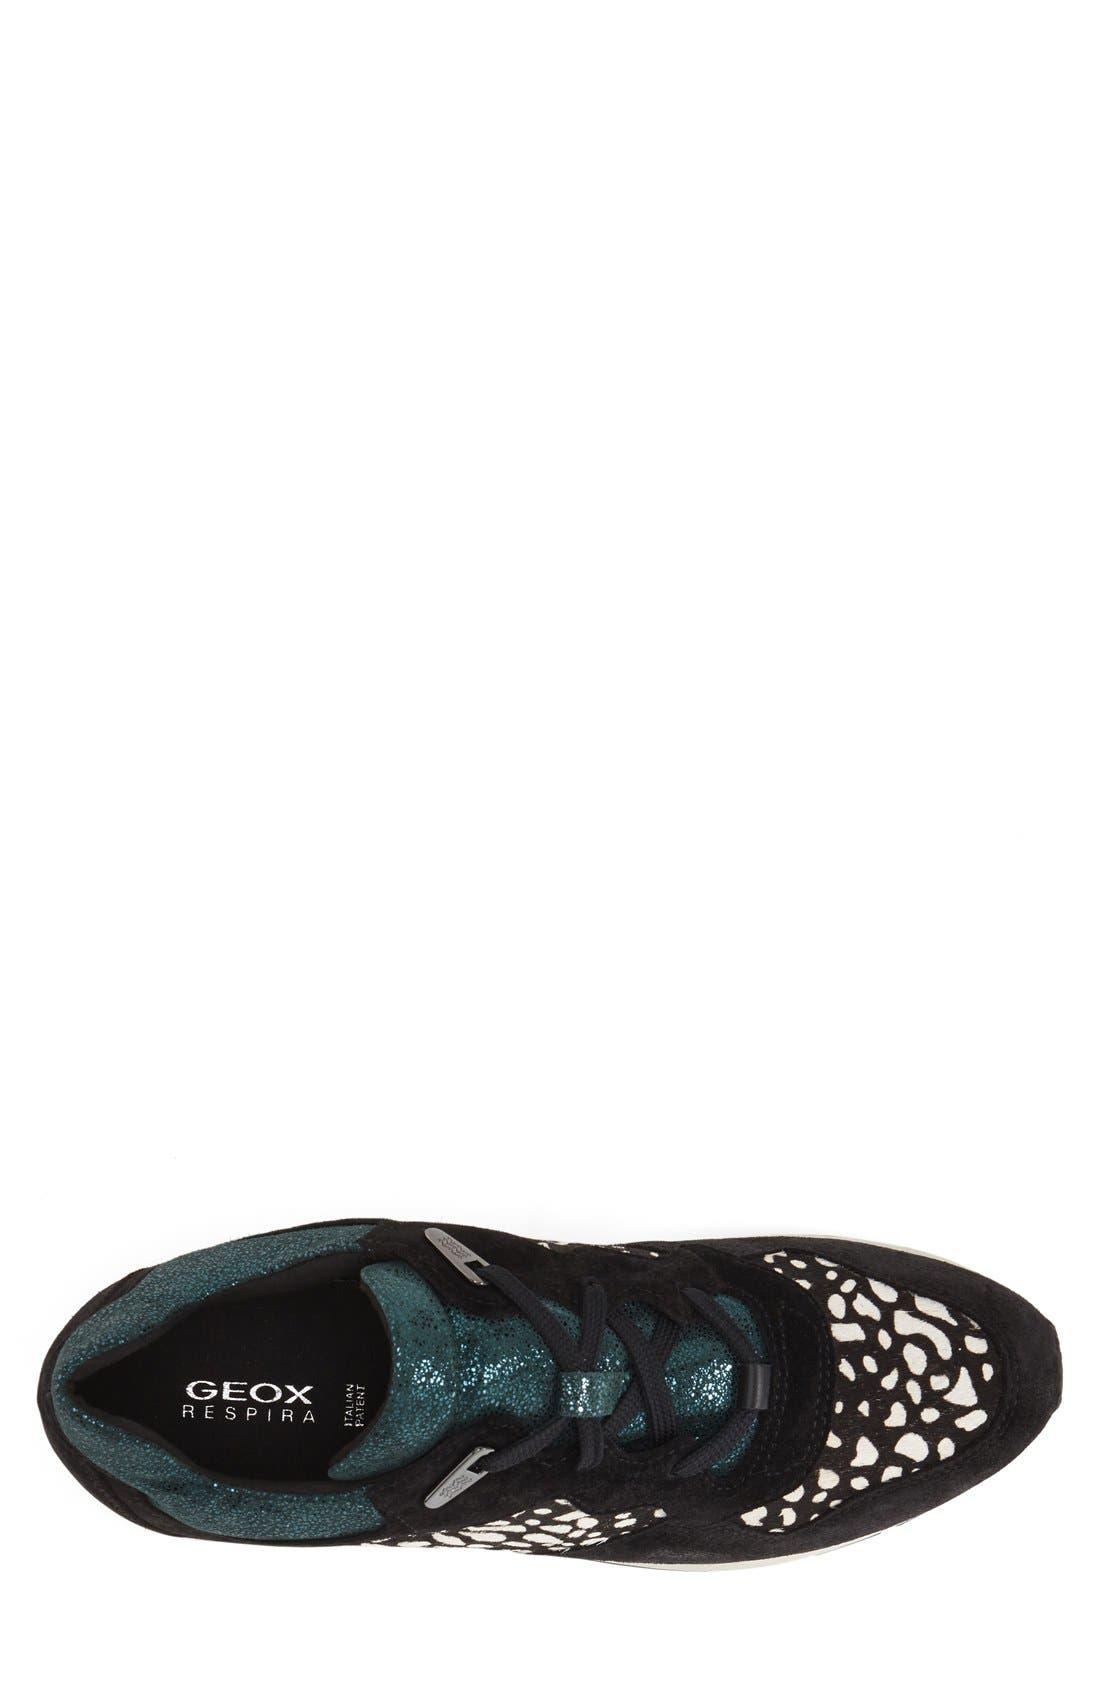 'Shahira' Sneaker,                             Alternate thumbnail 3, color,                             001